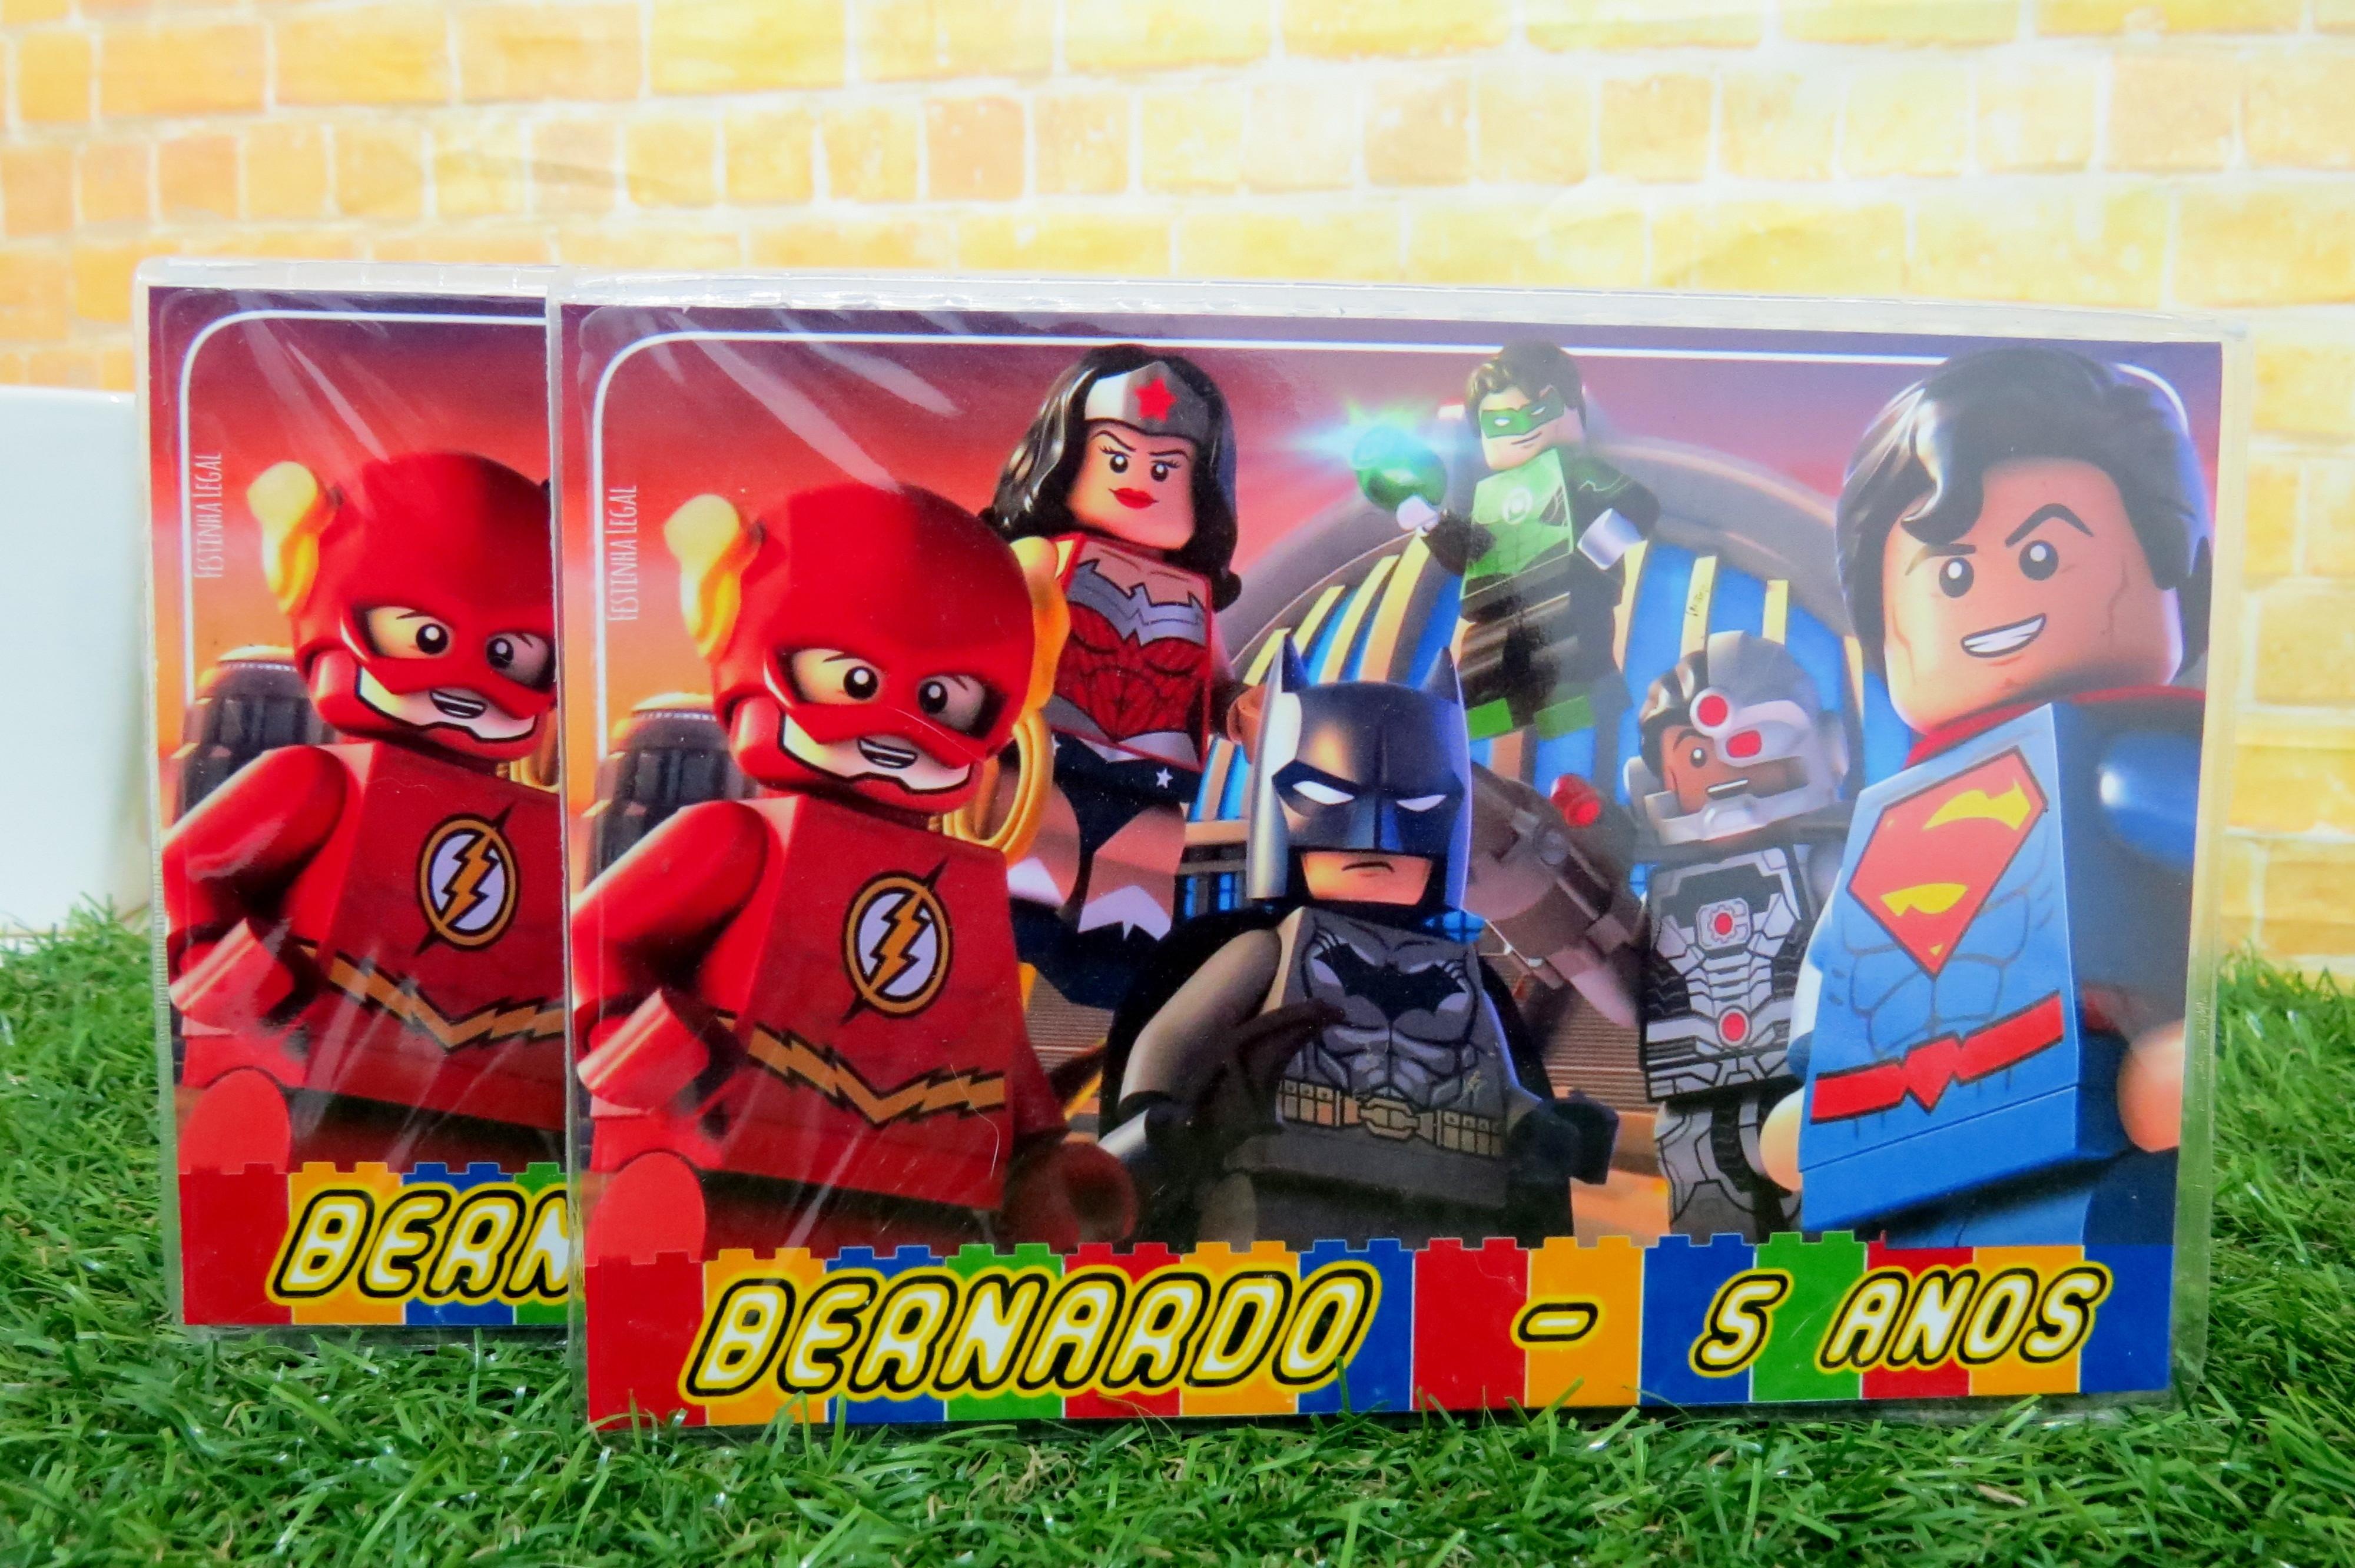 40 Maletas 31 Itens Colorir Lego Liga Da Justica Completas No Elo7